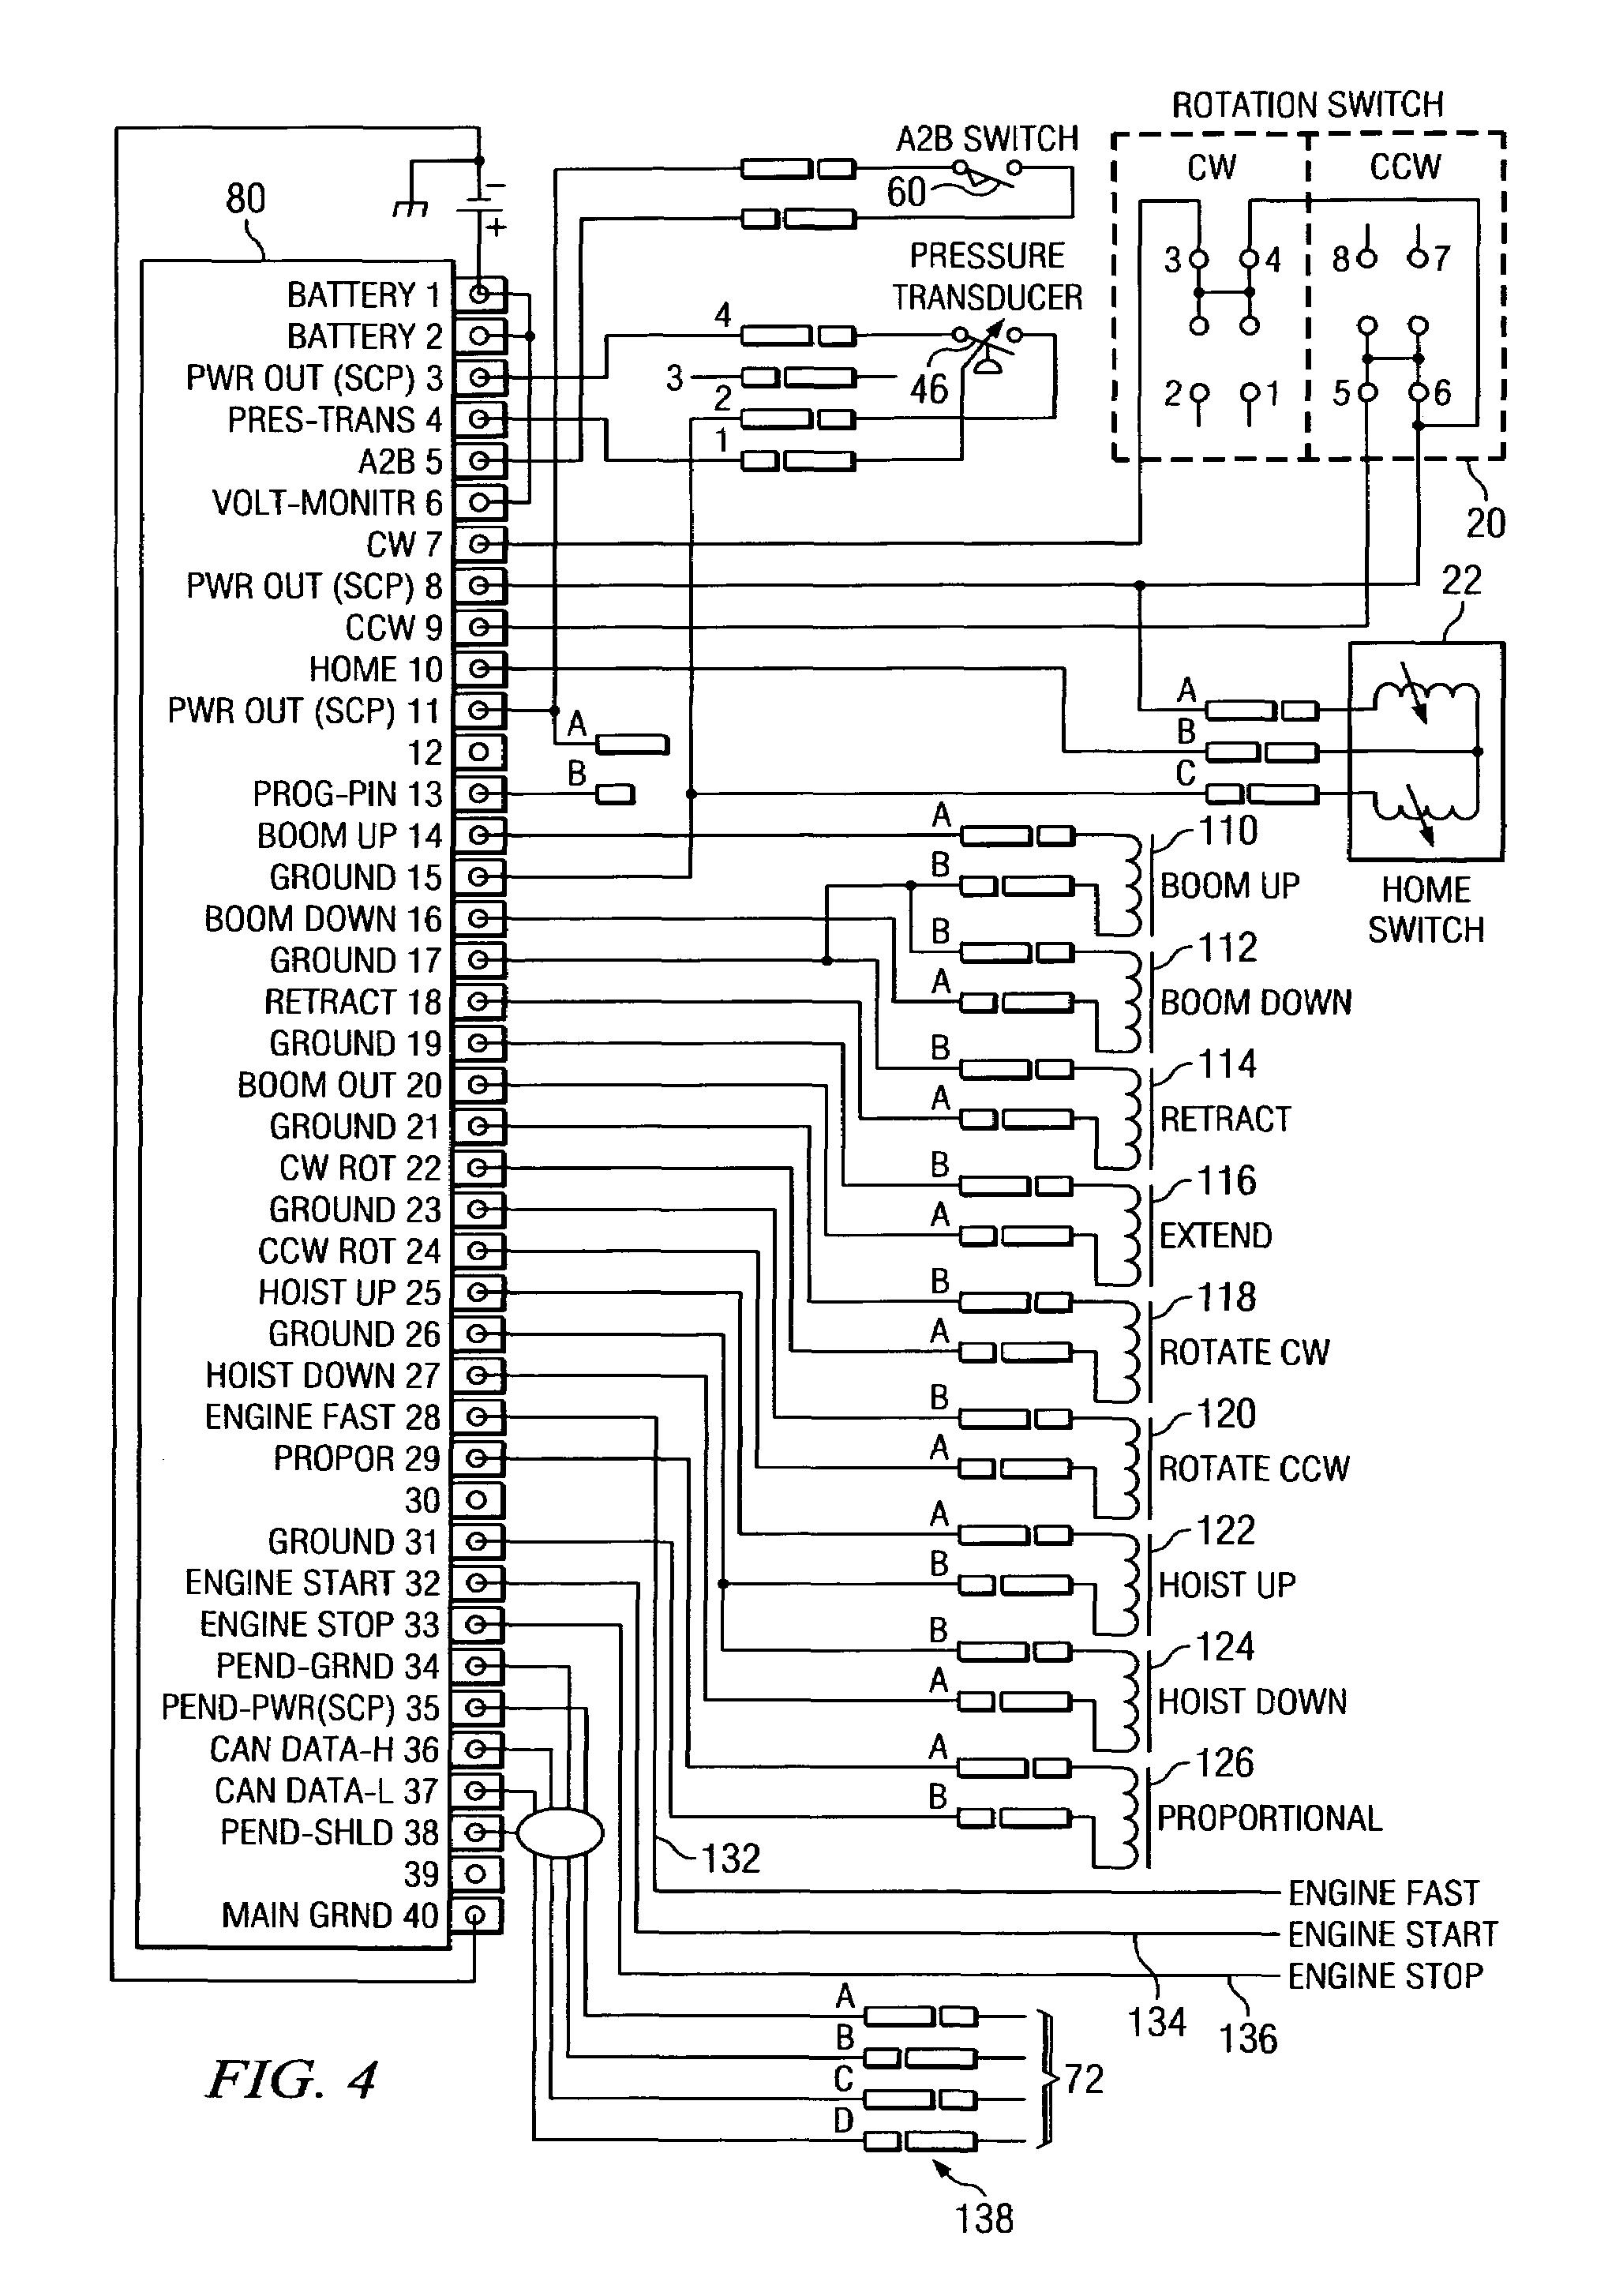 RO_3353] Skyjack Scissor Lift Wiring Diagram On Jd Harley Wiring Diagram  Free DiagramNedly Exxlu Icand Garna Phae Mohammedshrine Librar Wiring 101